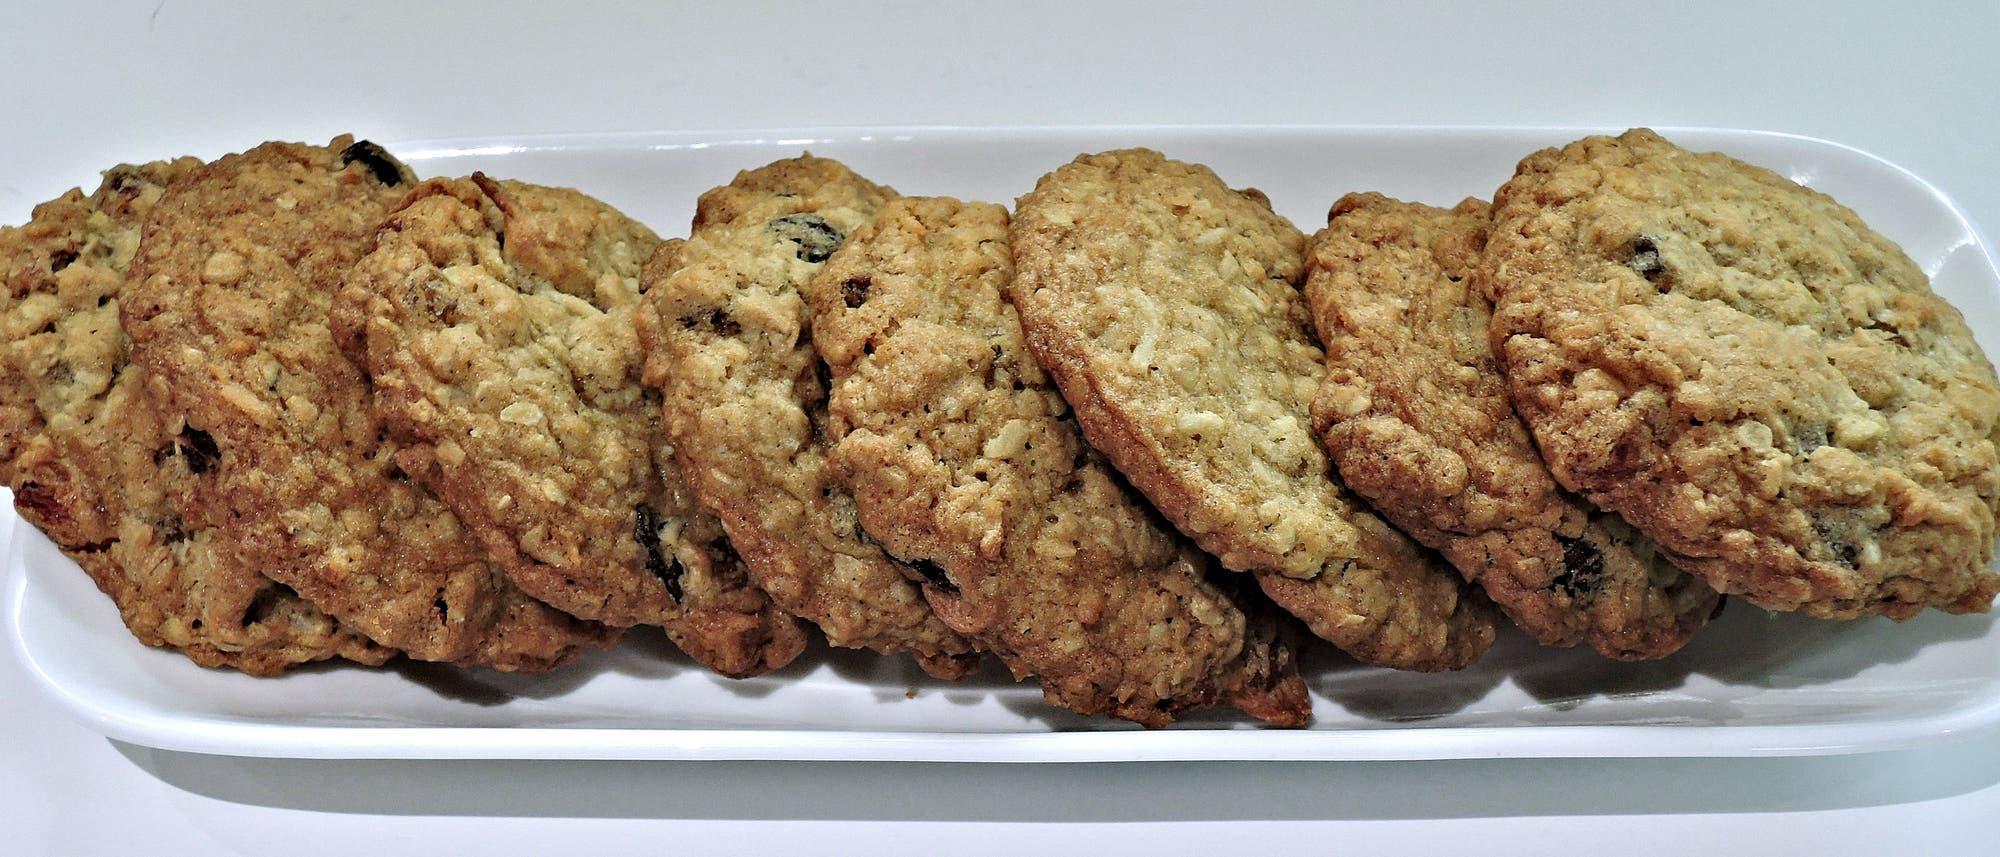 Hafer-Kokos-Kekse mit Rosinen